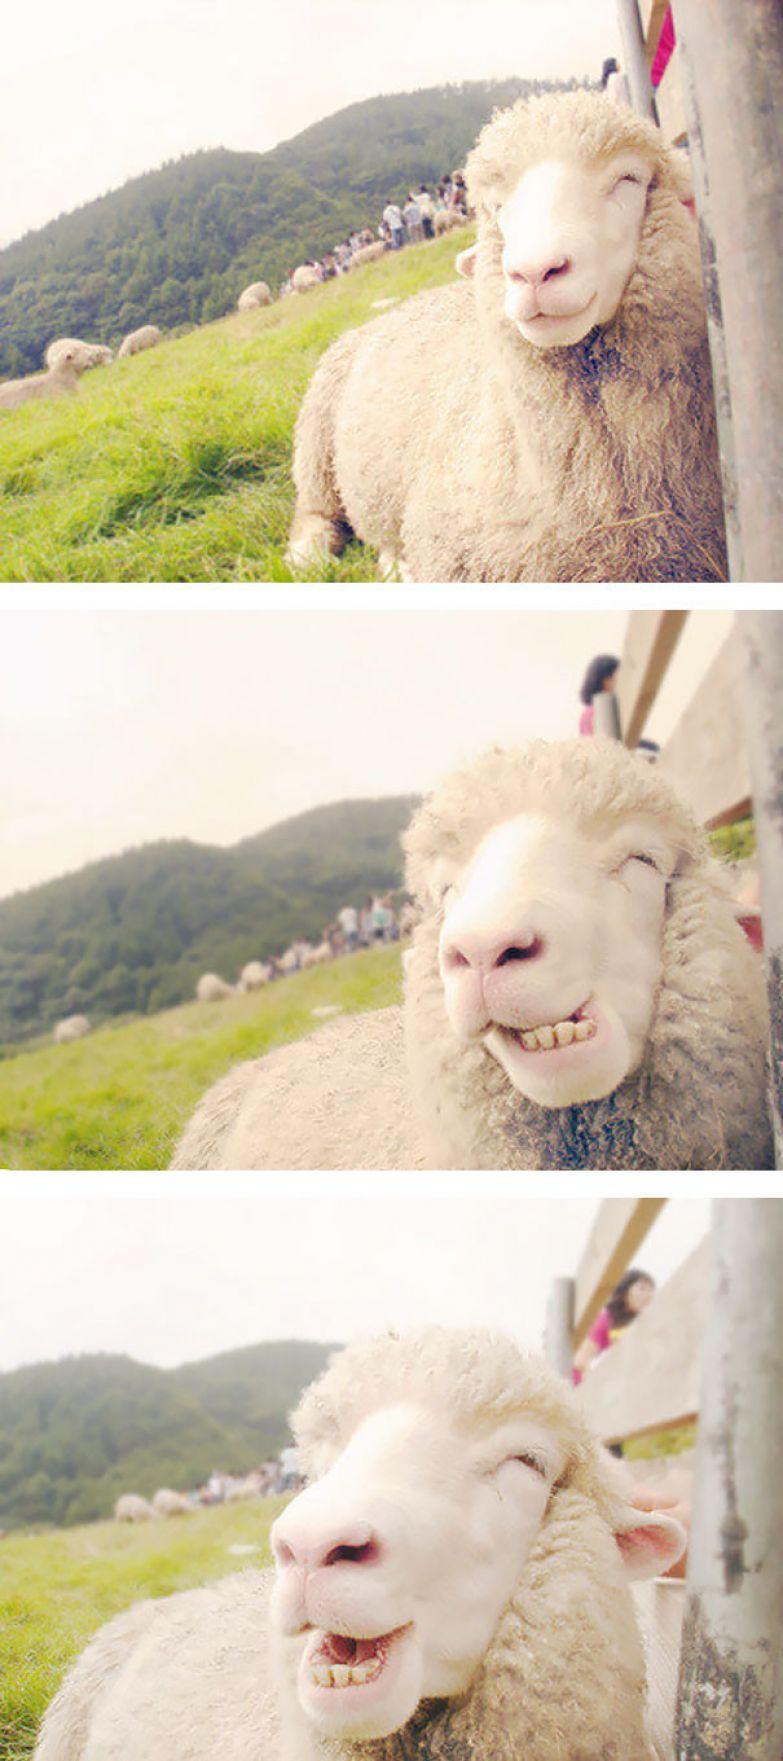 24. животное, улыбка